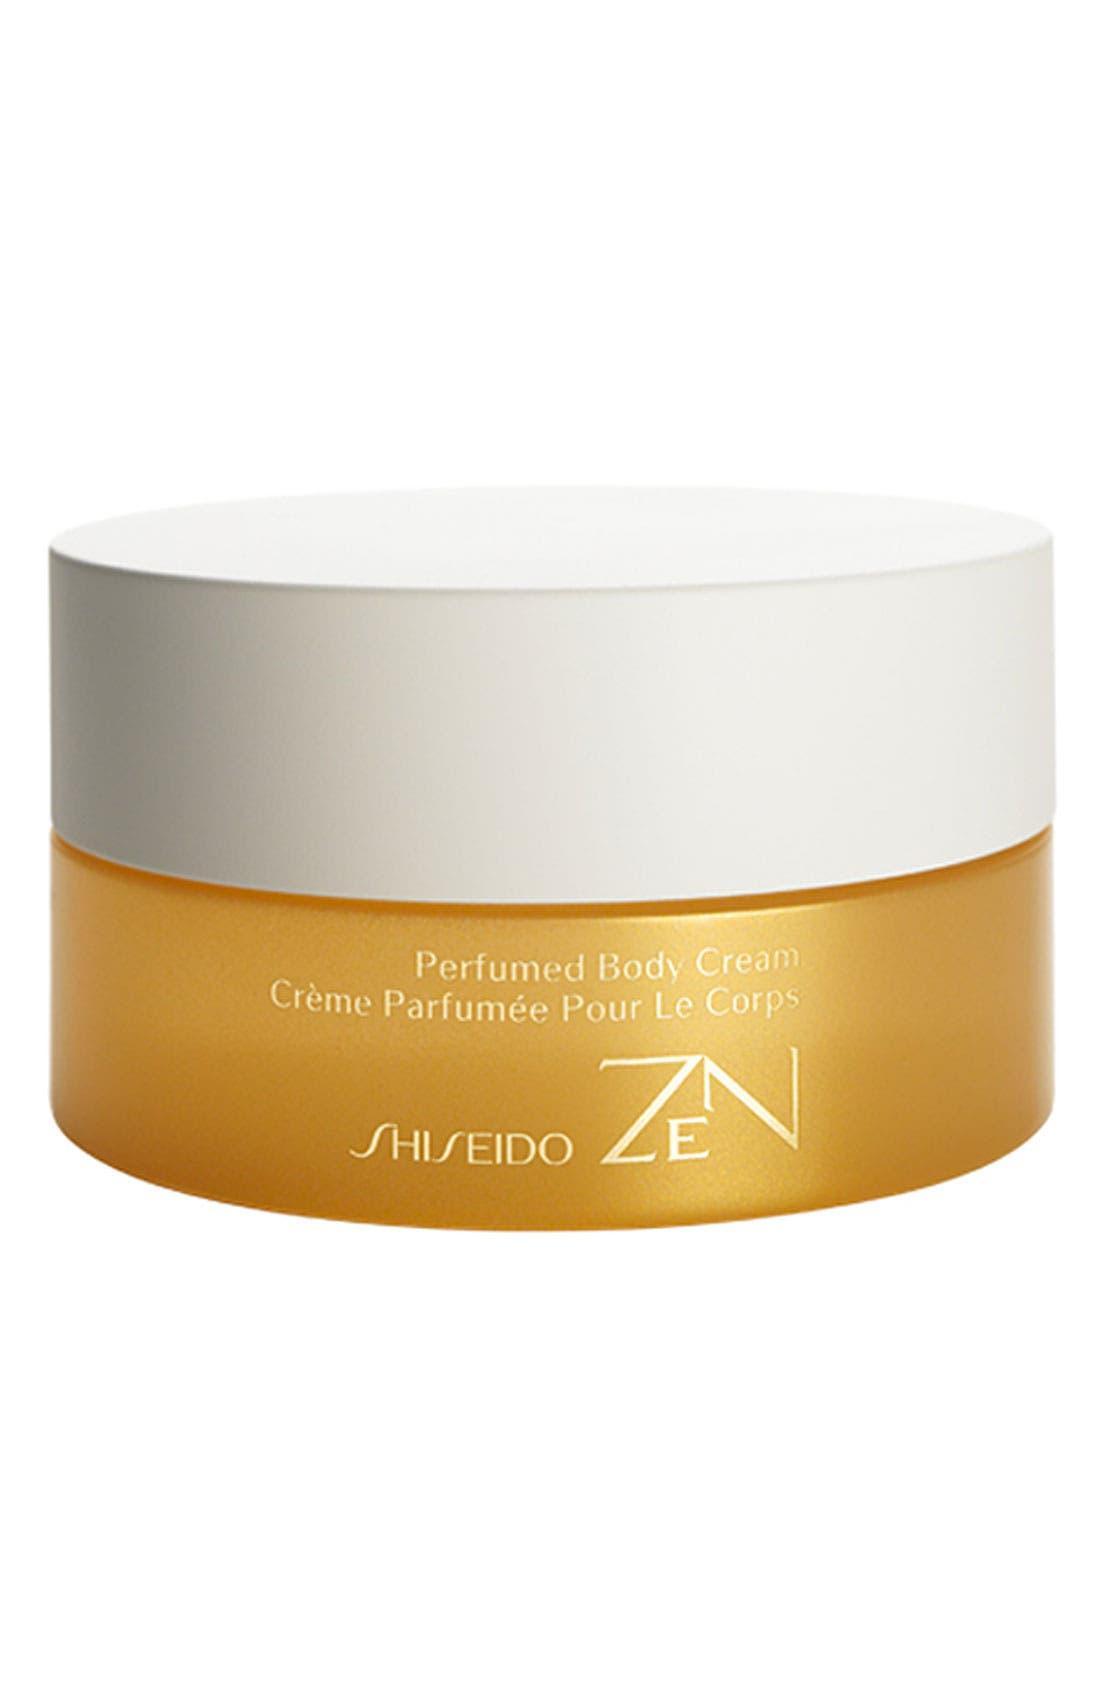 'Zen' Perfumed Body Cream,                             Main thumbnail 1, color,                             000